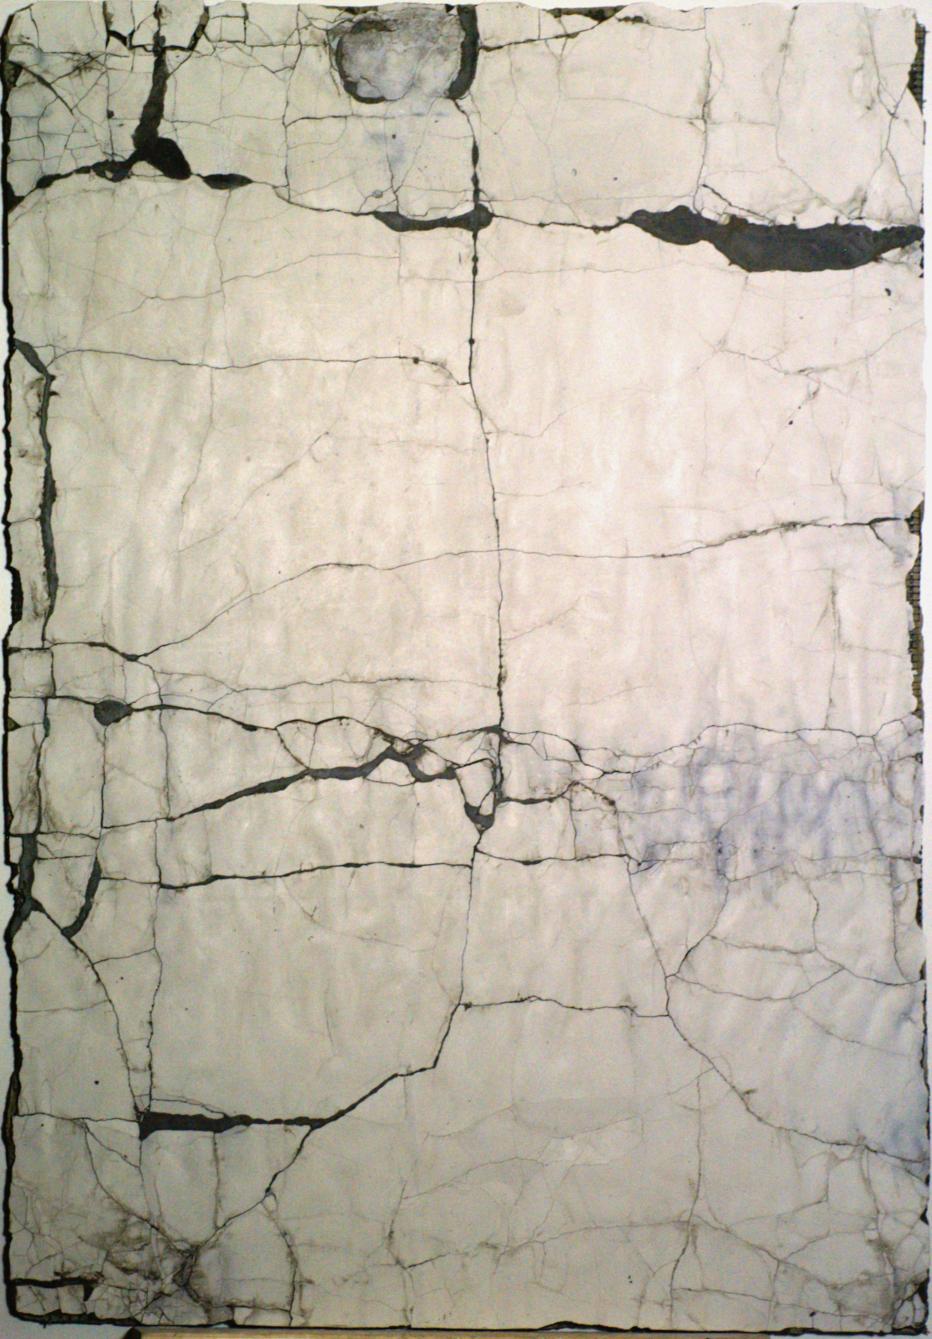 Unikale Wandverkleidung Fur Anders Sein Neurotiker Design Paneele Mit Reeller Kalk Zement Oberflache Auf Einem Kork Kern Wandfliesen Wanddesign Zement